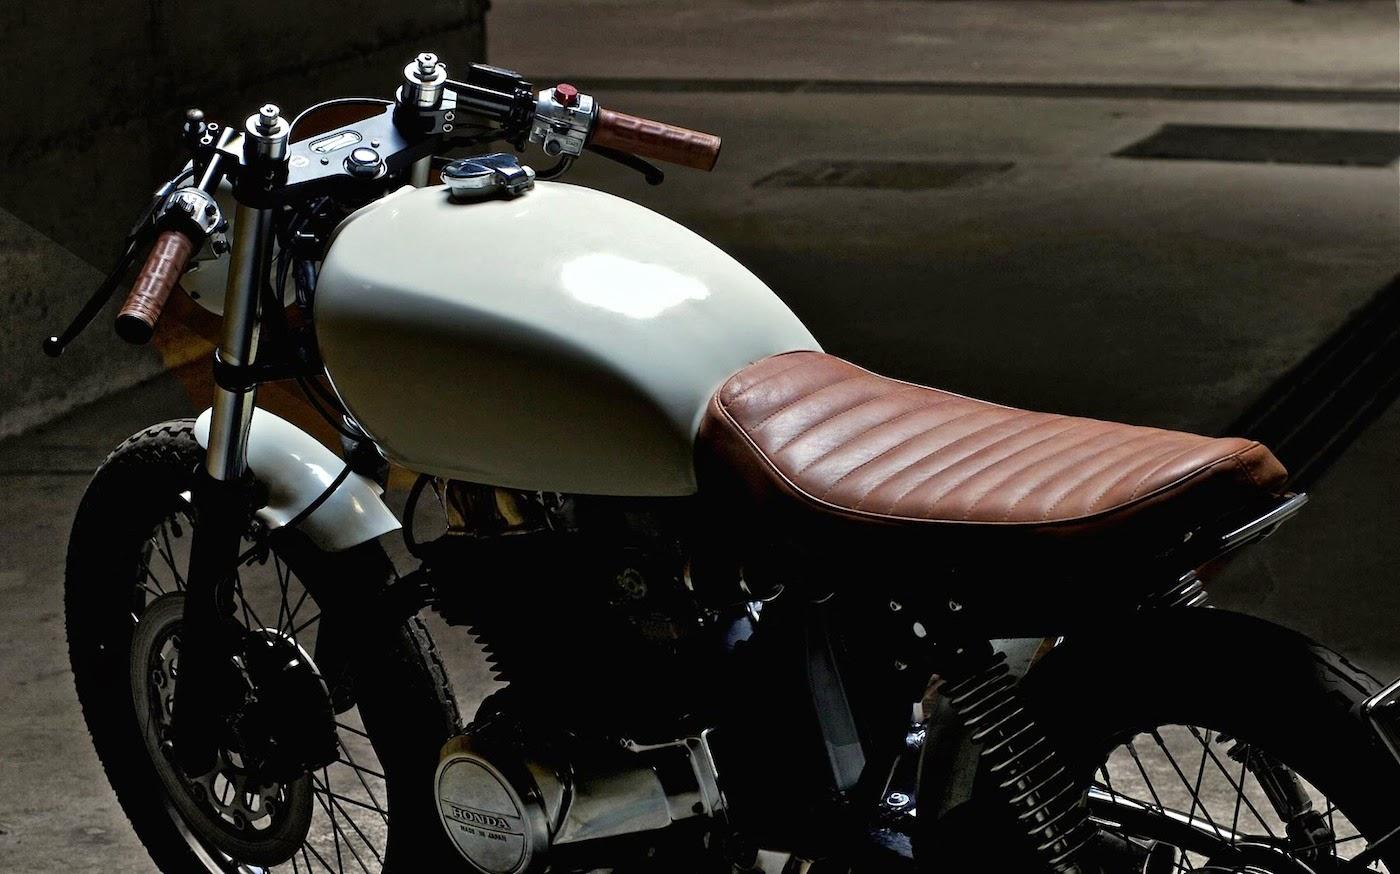 Custom Honda CB400 A Elegant Bike Based On CB400N This